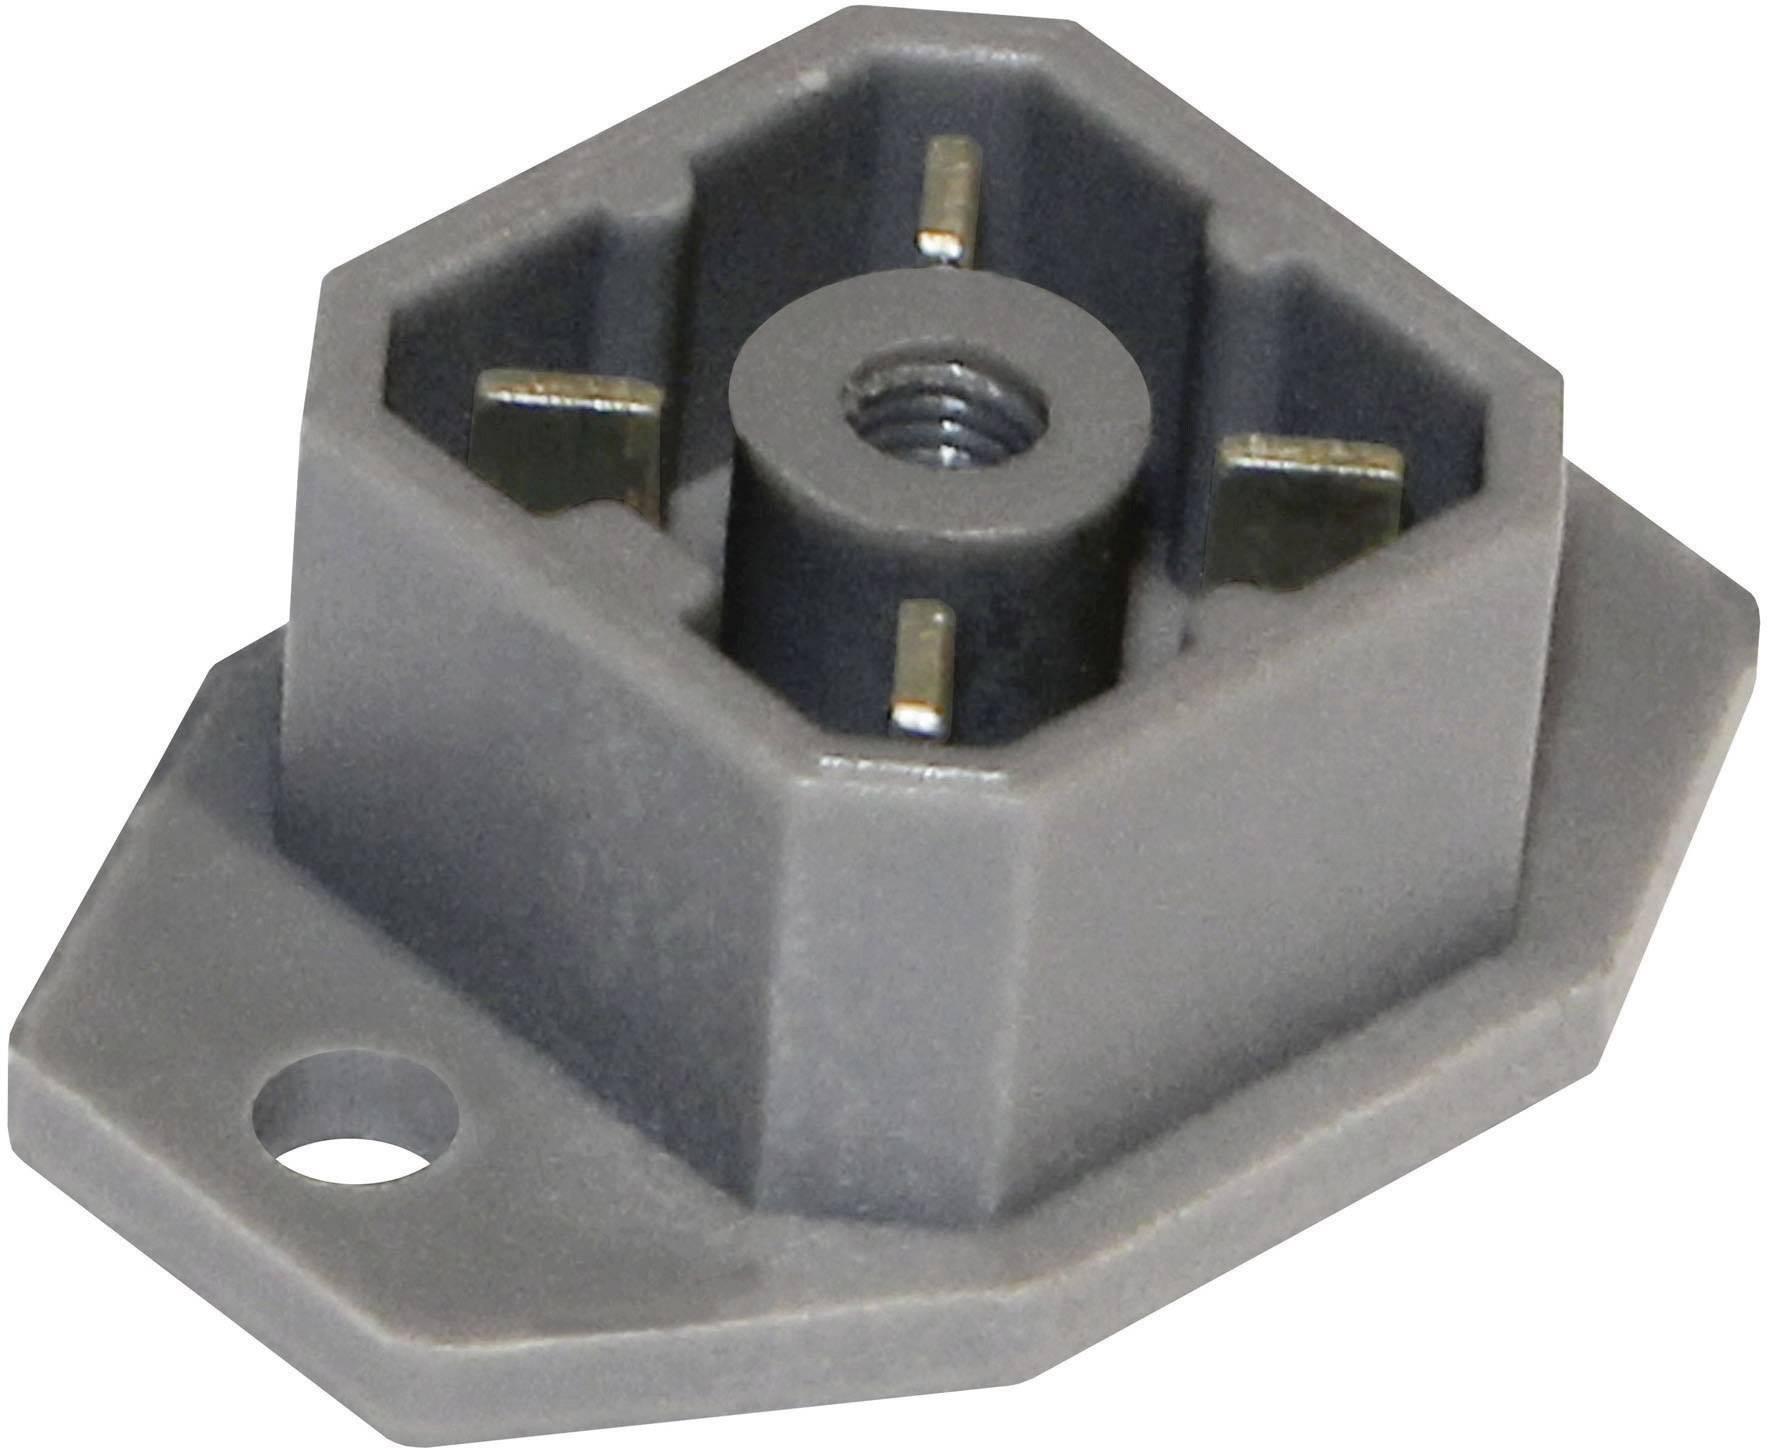 Konektor ventilu HTP BP3G04000-F (BP3N04000-F), černá